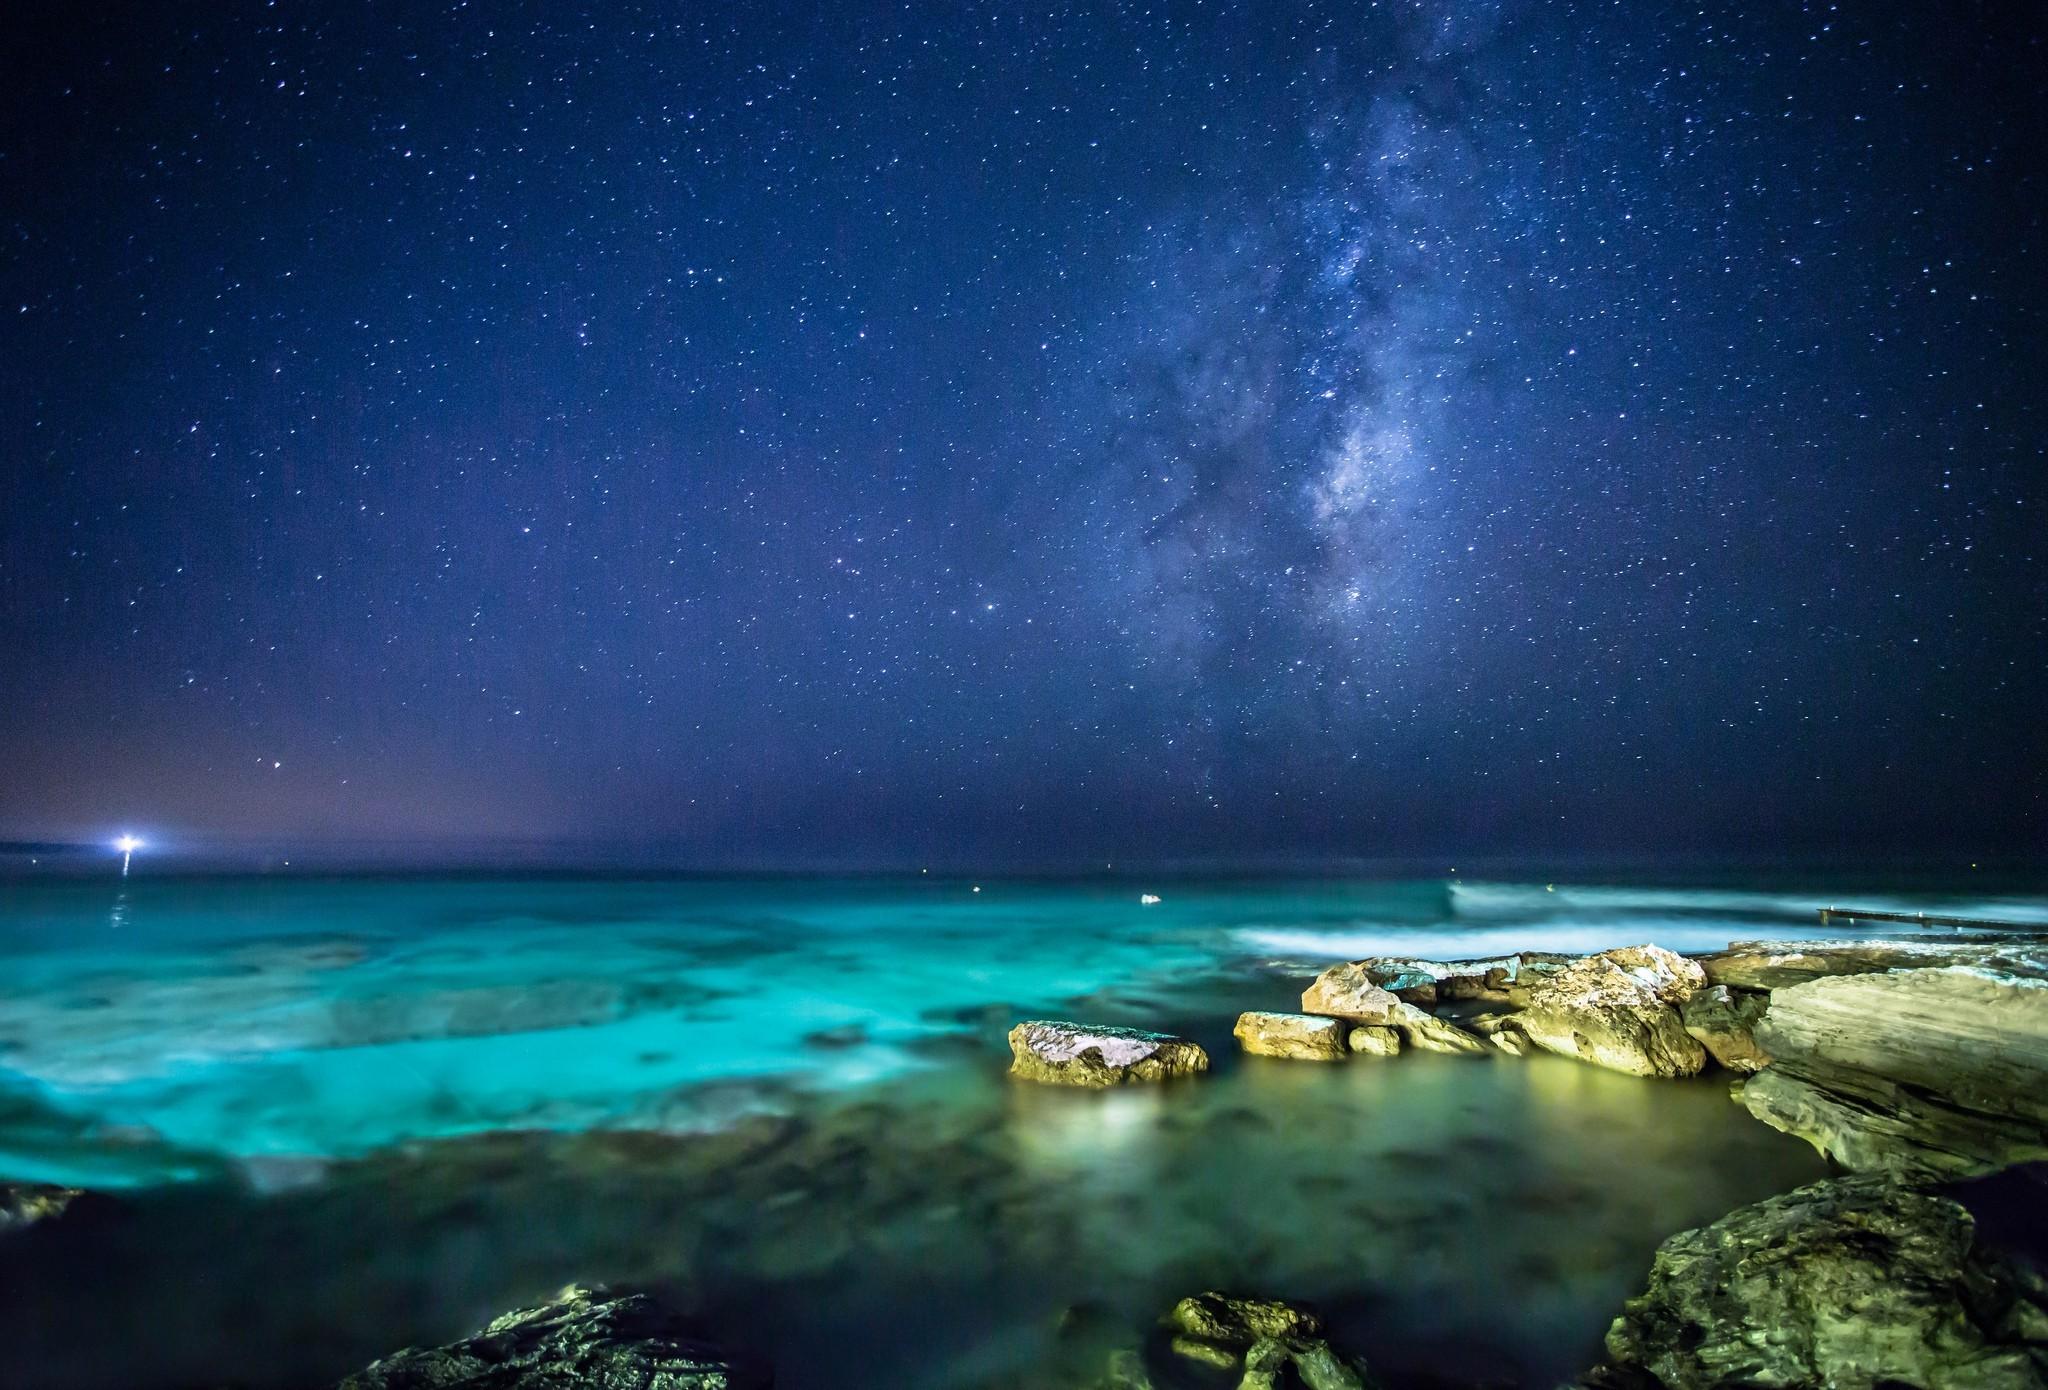 2048x1390 Px Landscape Night Sea Stars